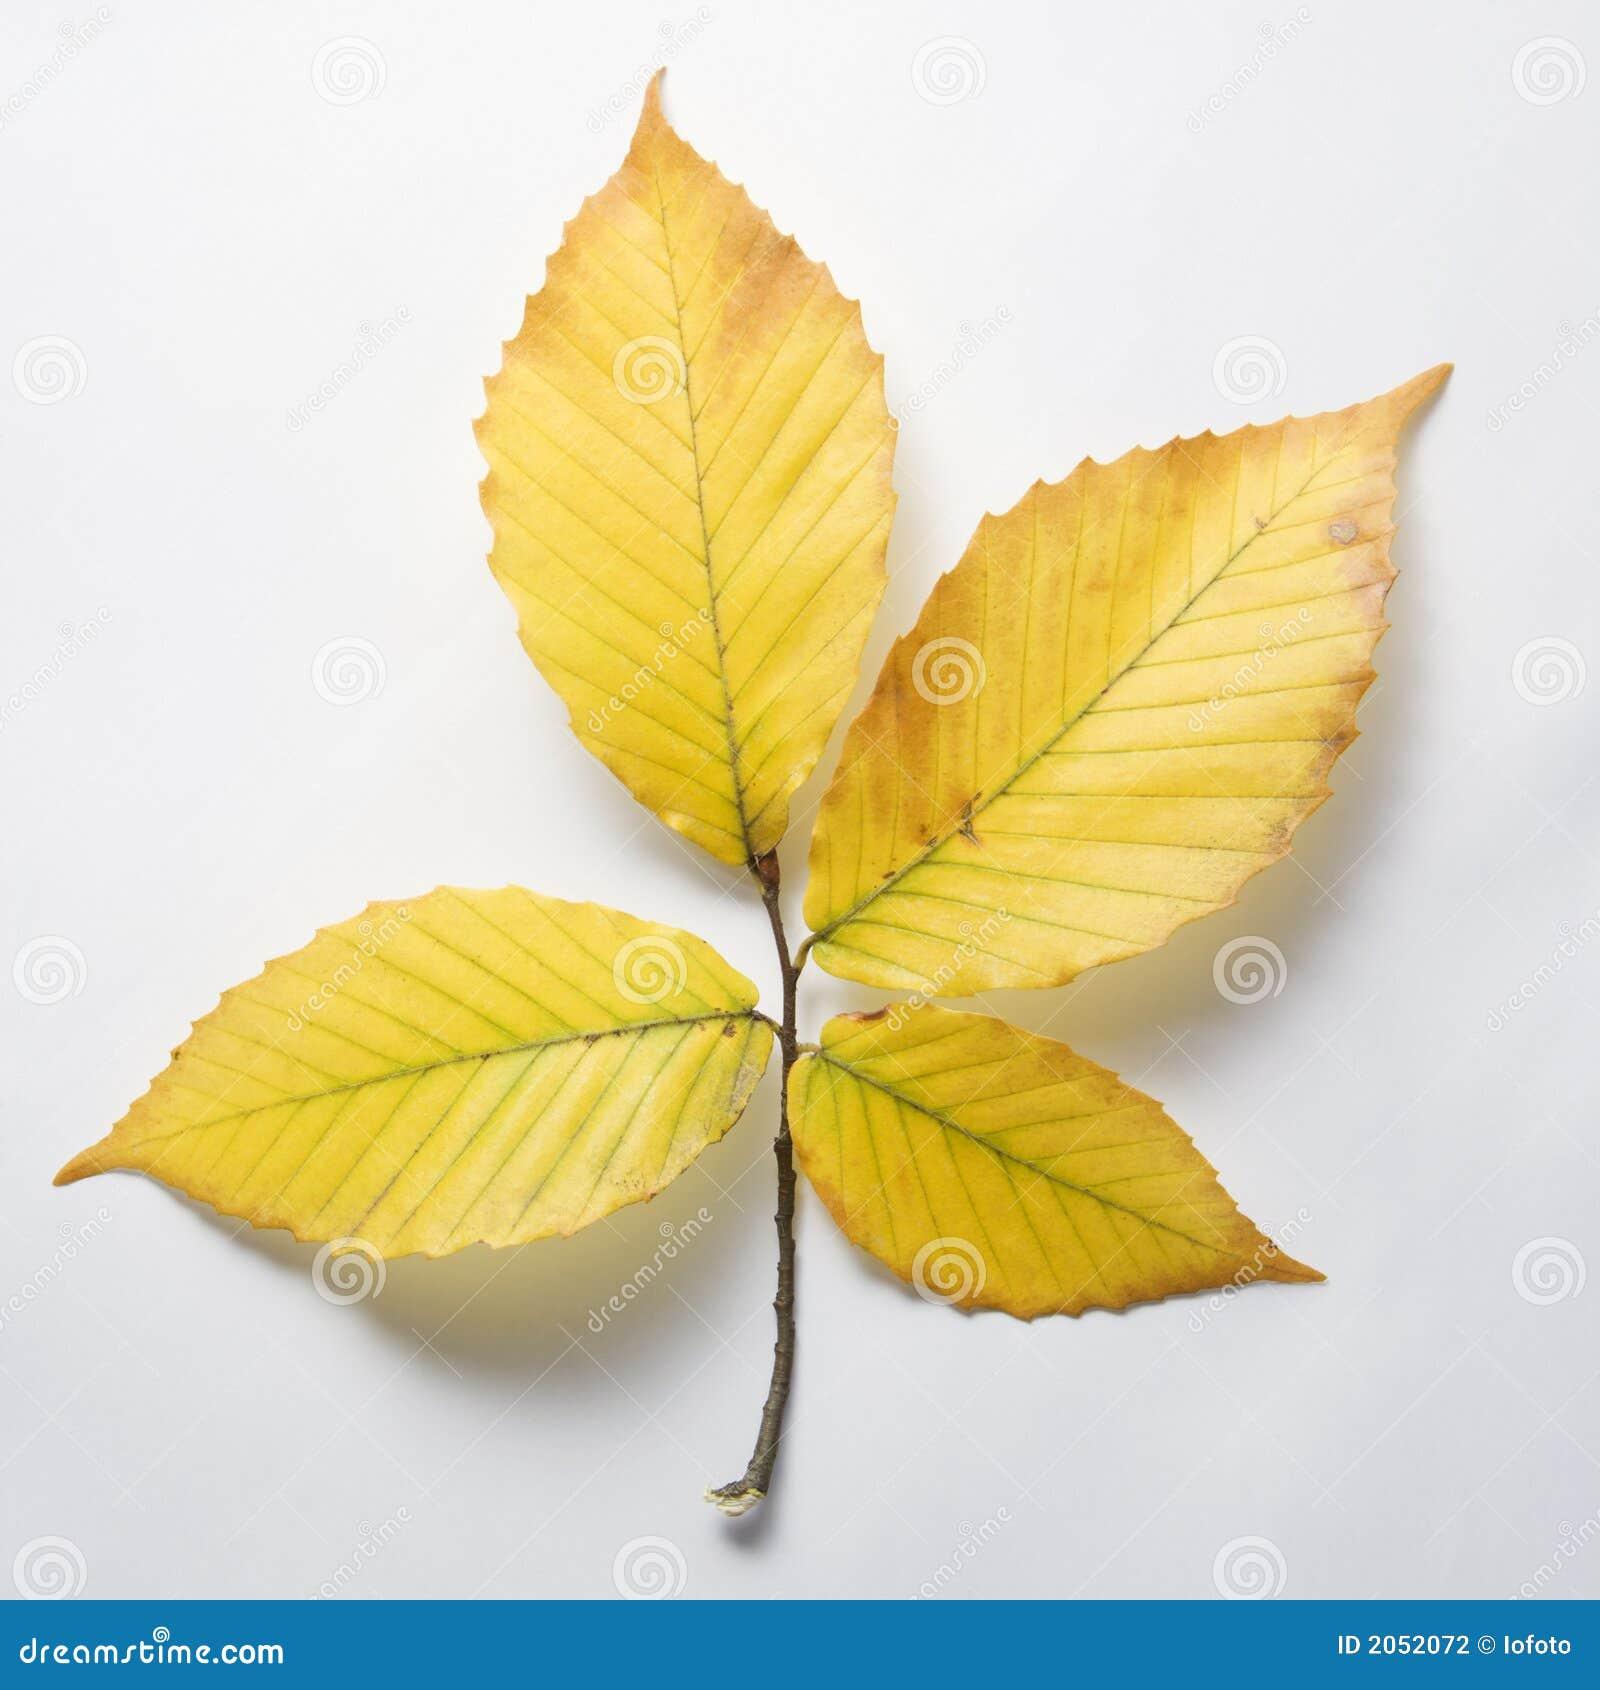 Branch of Beech tree leaves.